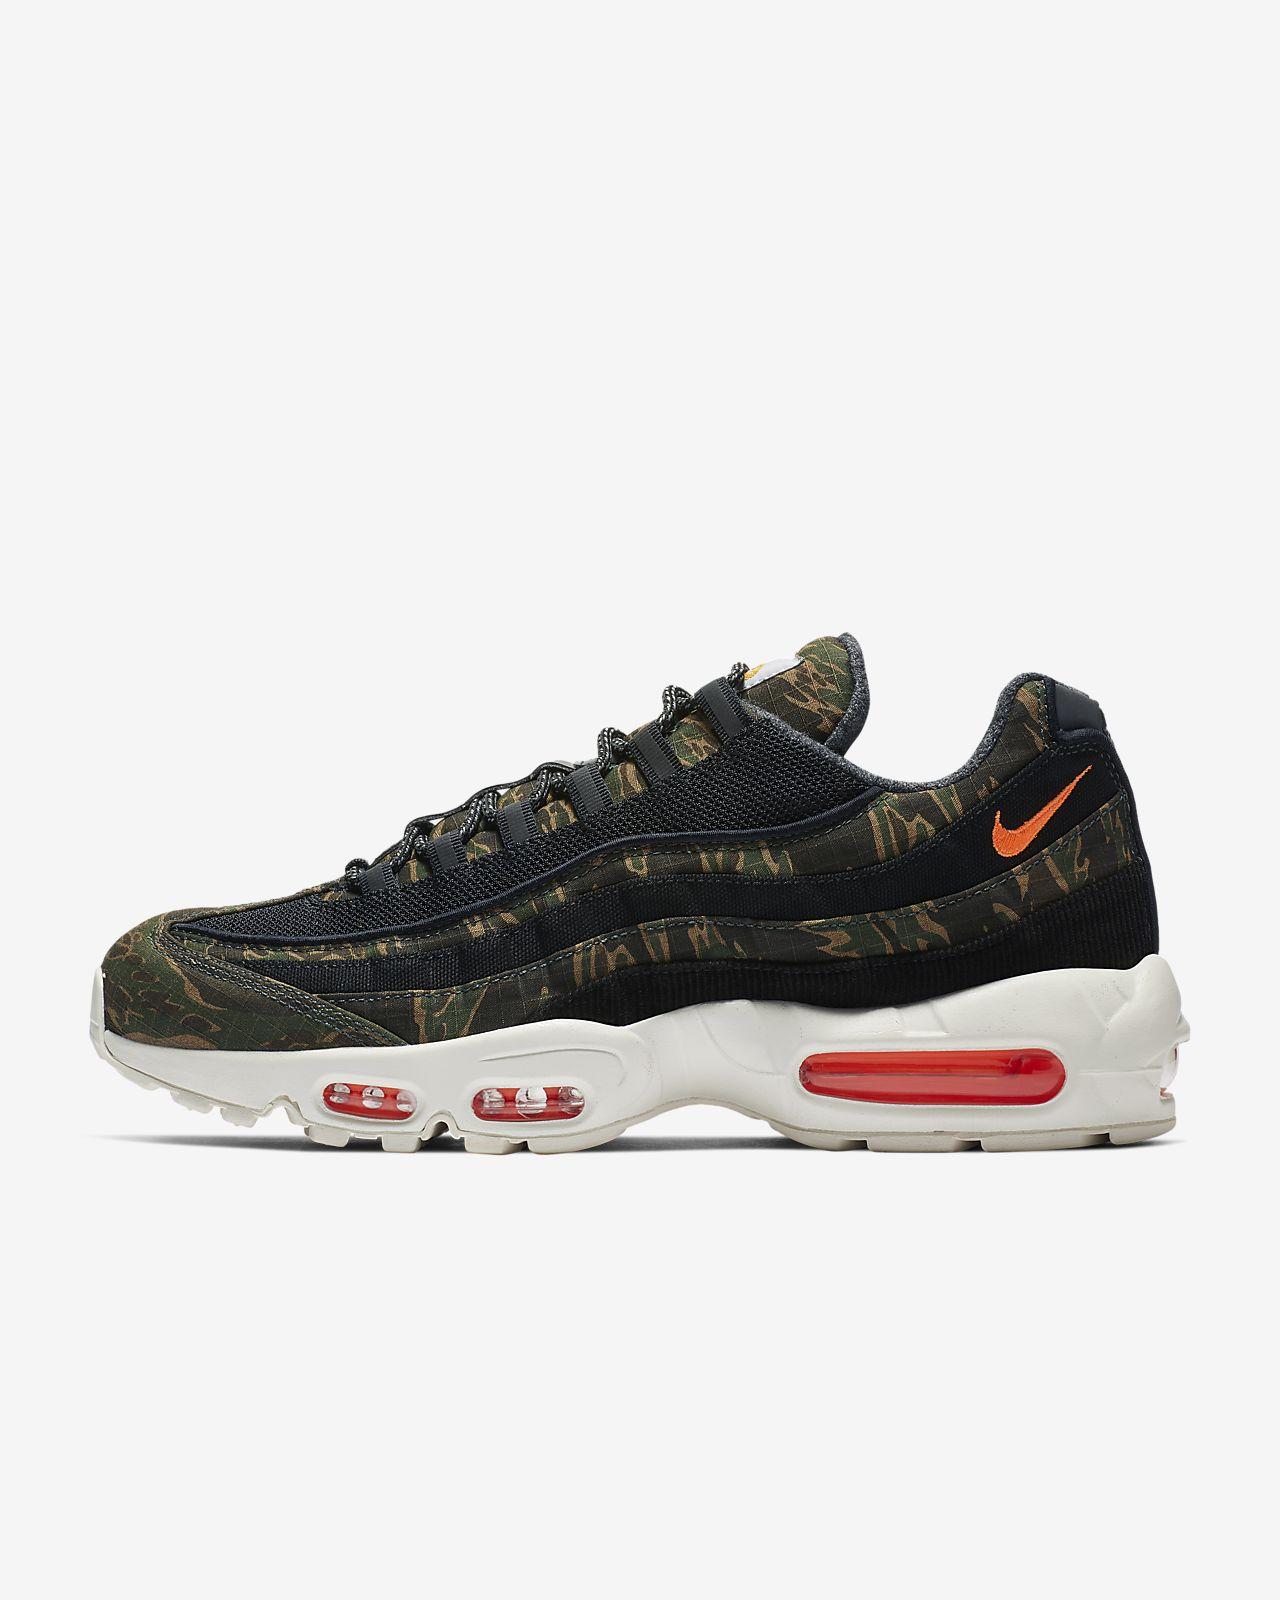 separation shoes 92f3a bf51e Men s Shoe. Nike x Carhartt WIP Air Max 95